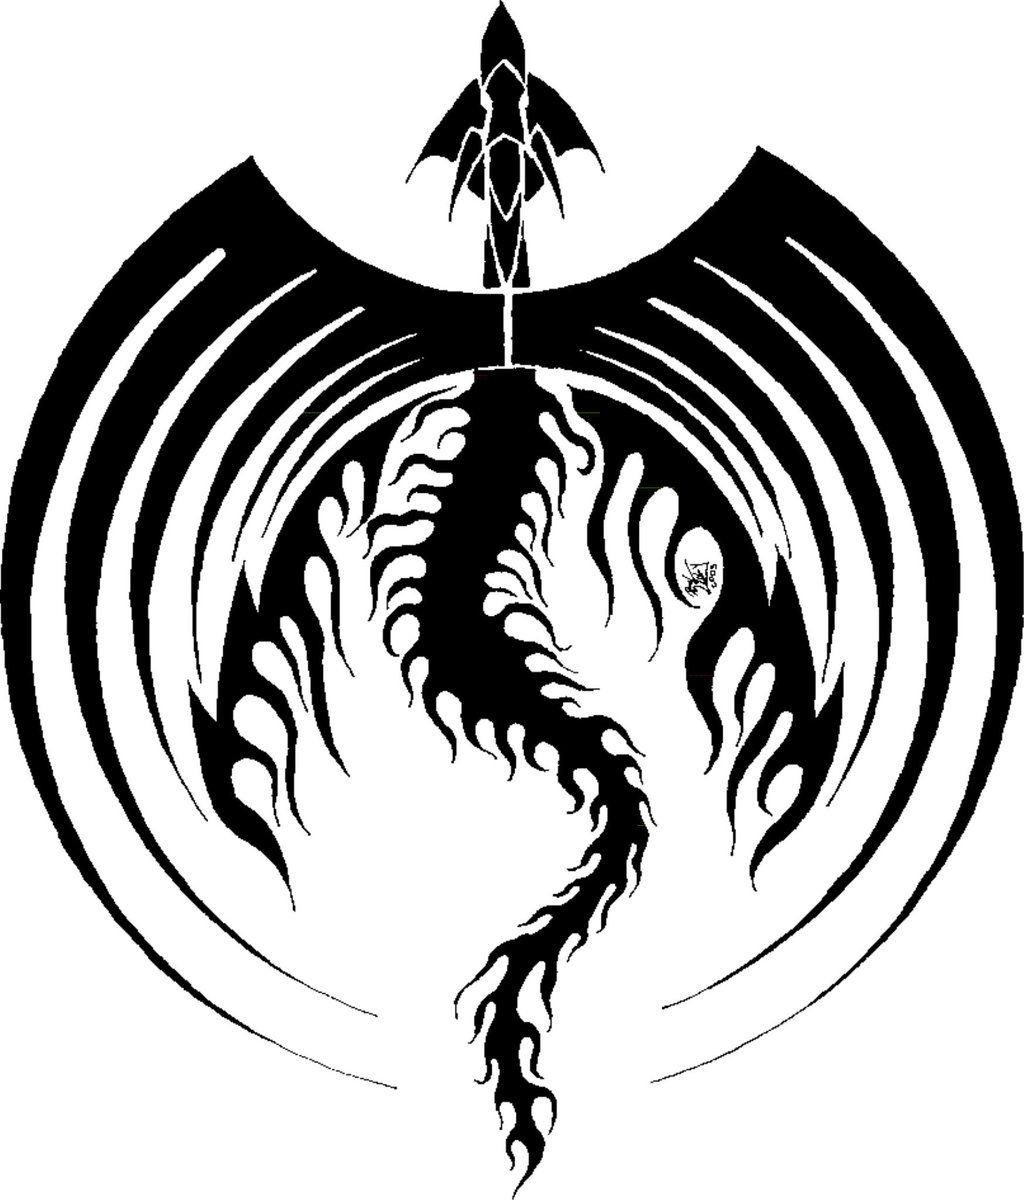 Welsh dragon tattoo designs - Awesome Dragon Tattoo Idea